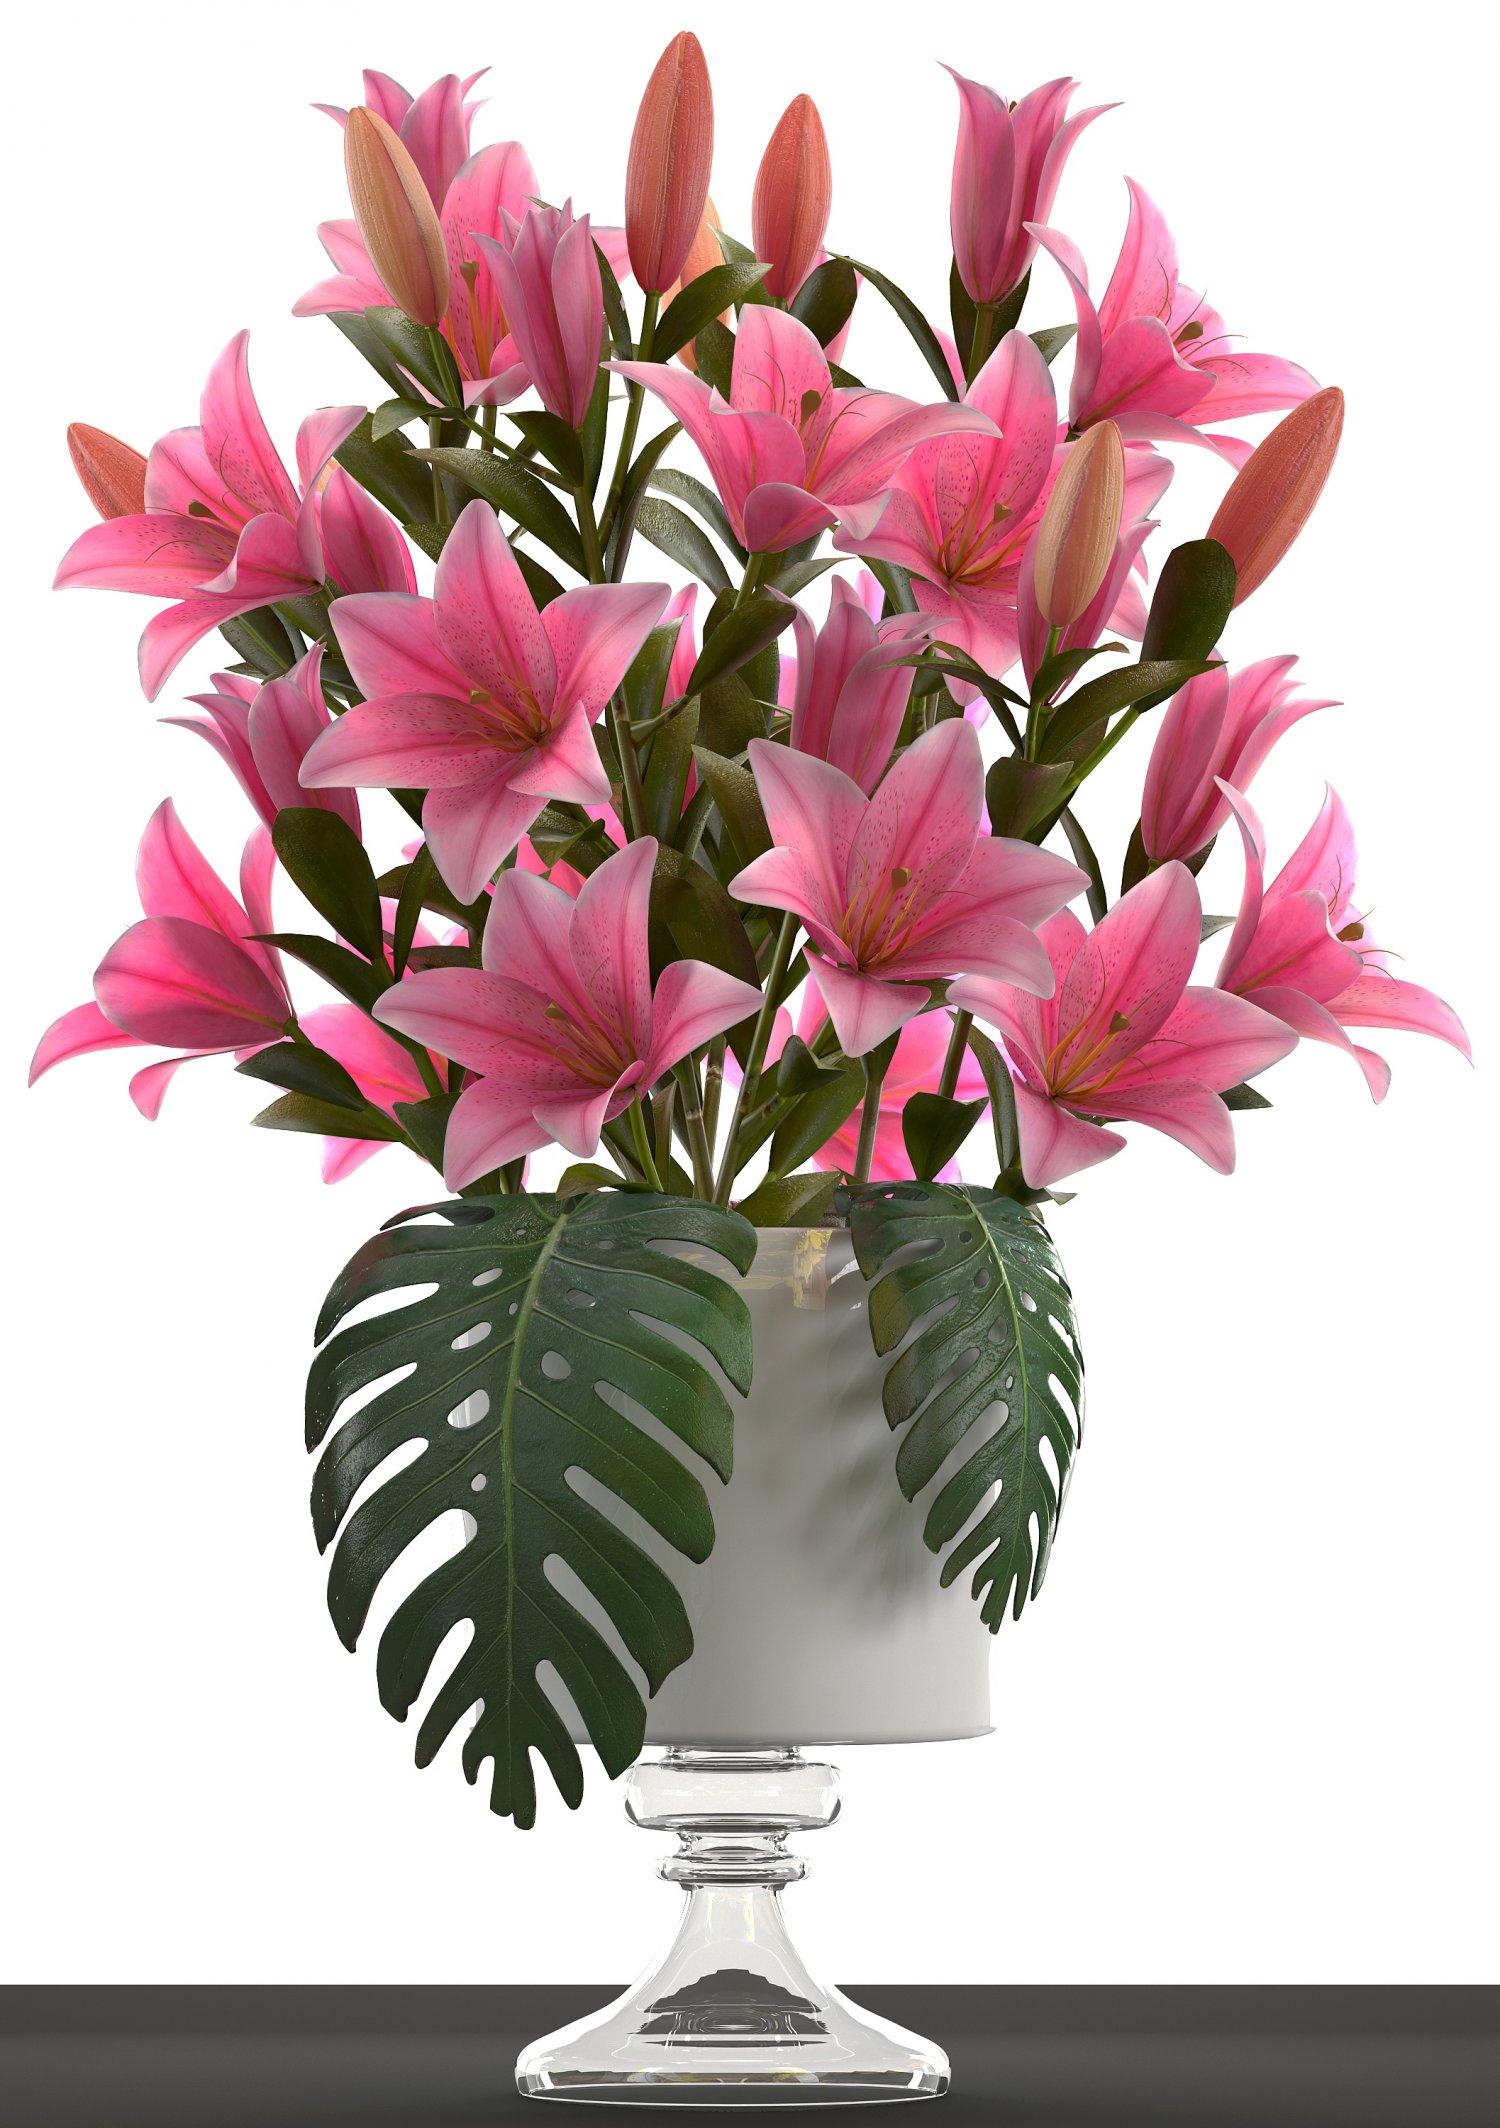 Bouquet of pink lilies 3d model in flowers 3dexport bouquet of pink lilies 3d model izmirmasajfo